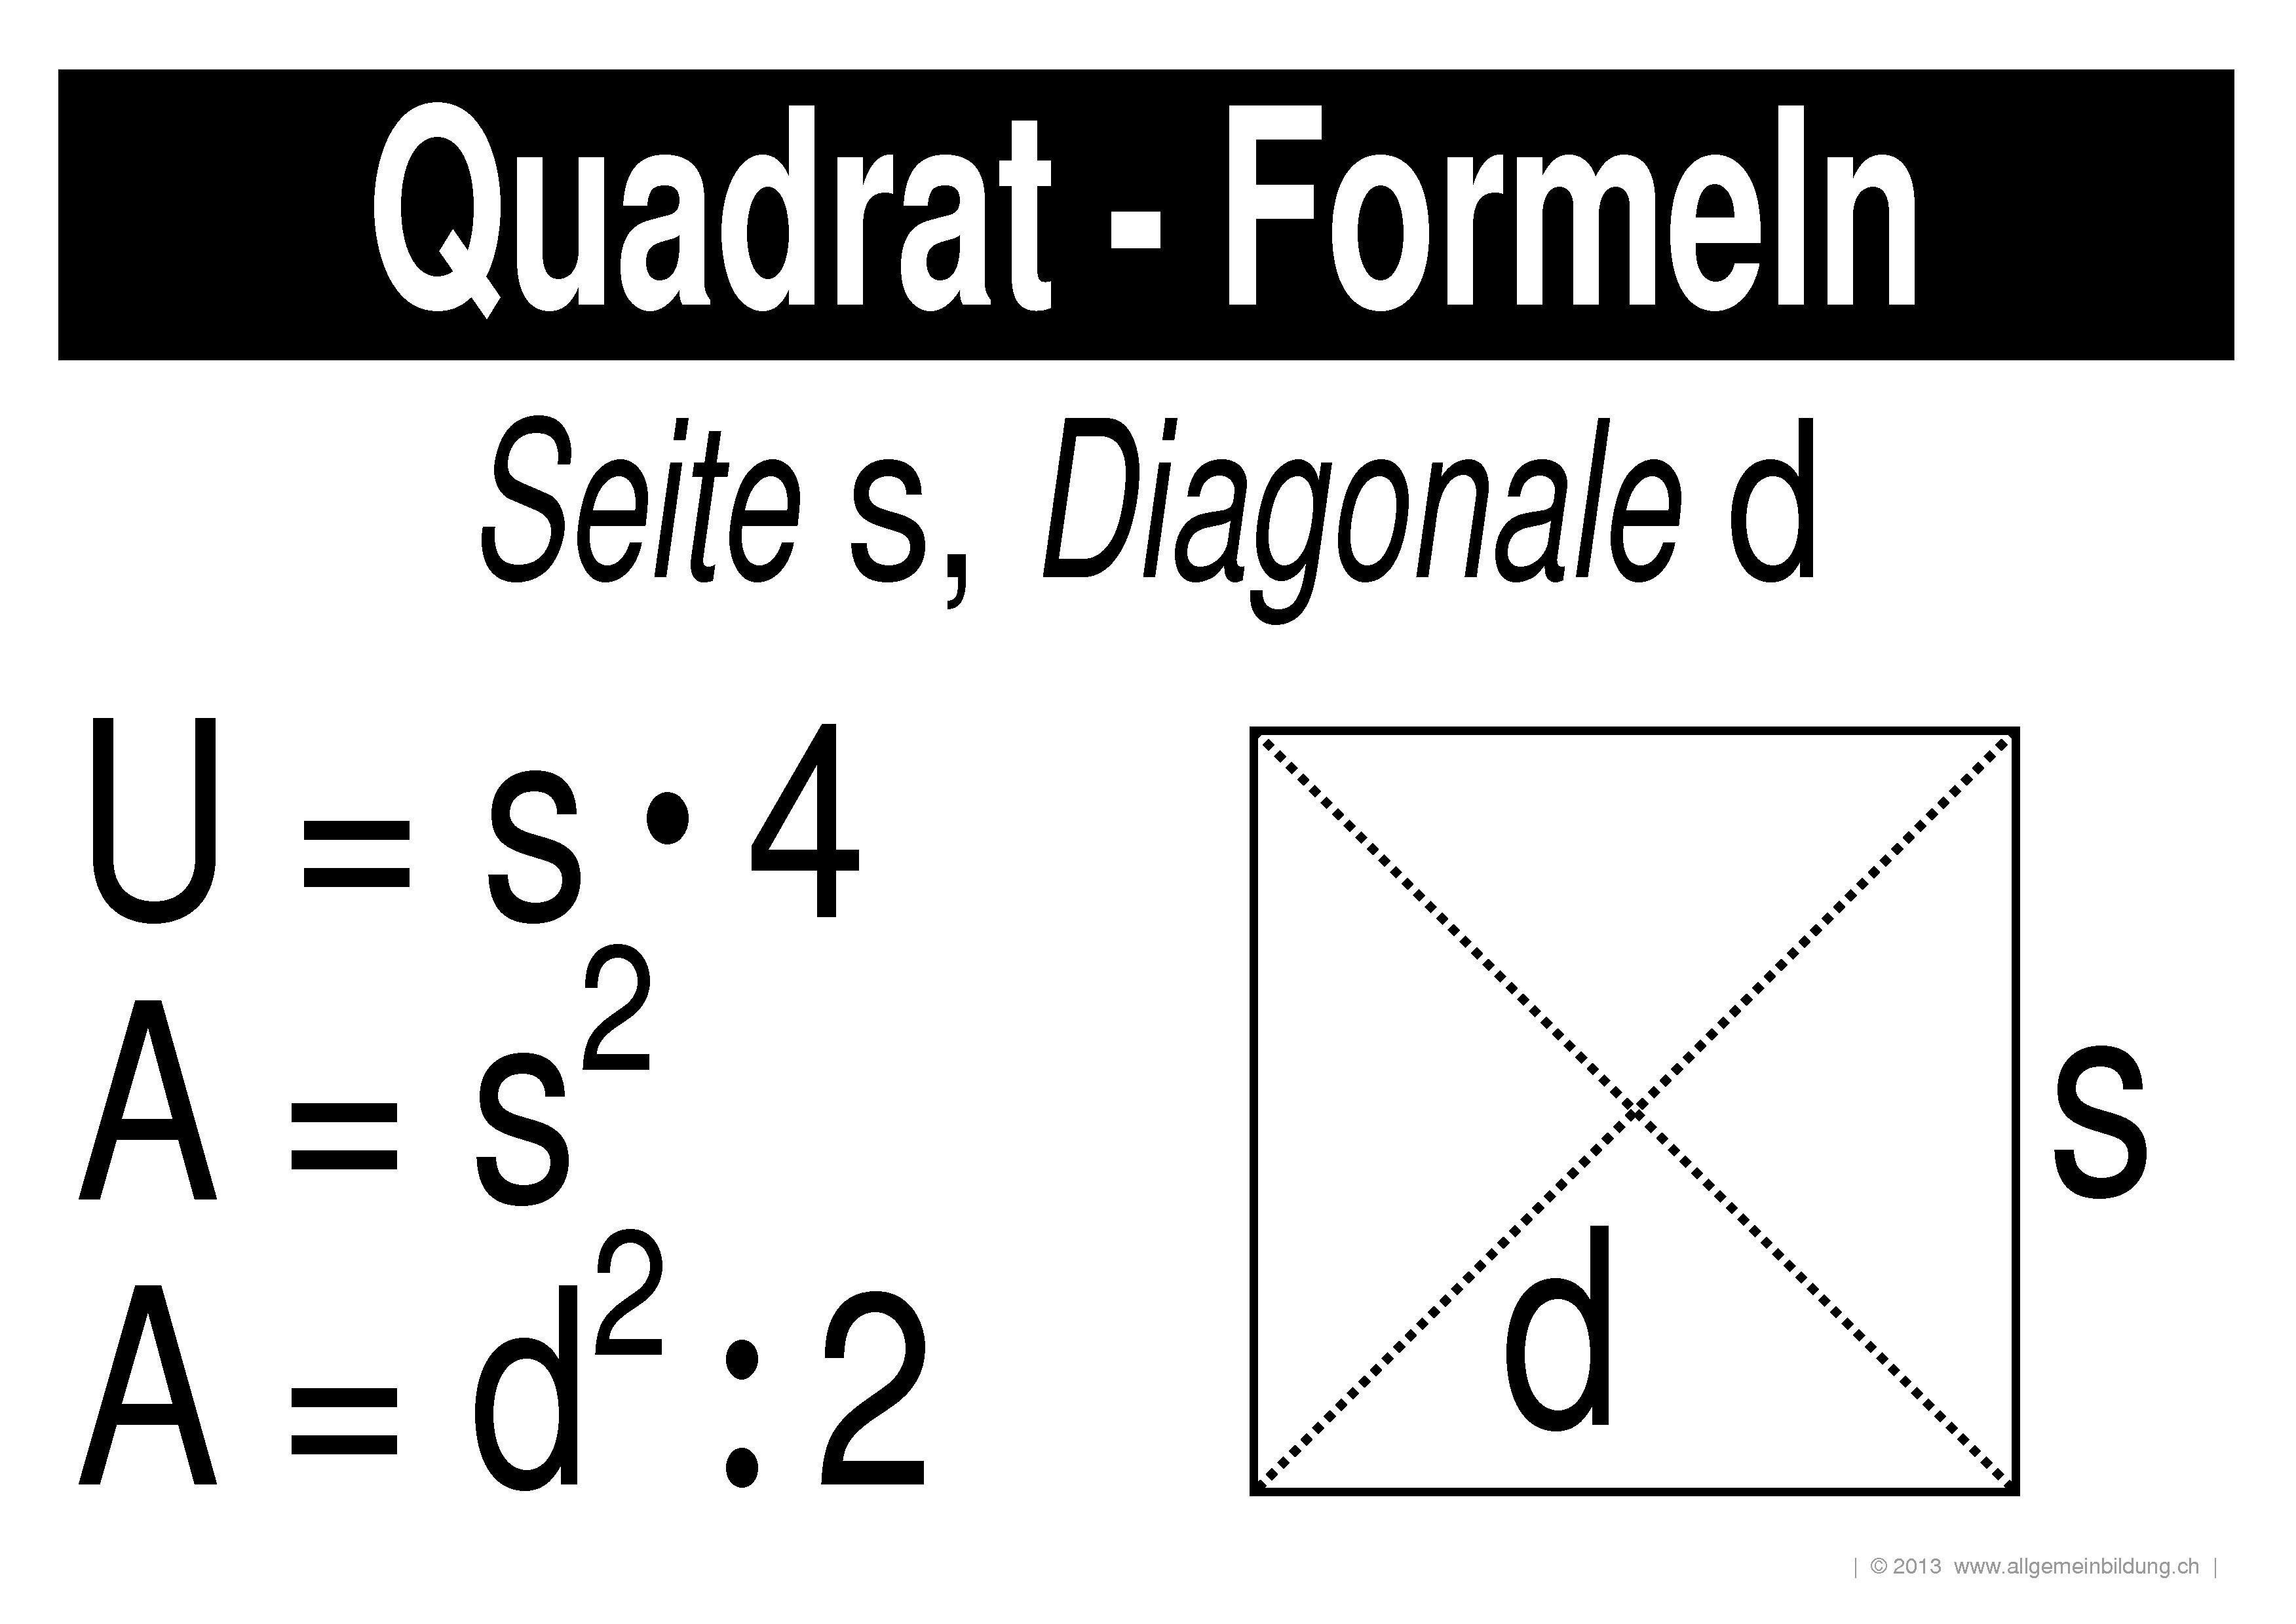 mathematik geometrie lernplakate wissensposter quadrat formeln 8500 bungen. Black Bedroom Furniture Sets. Home Design Ideas